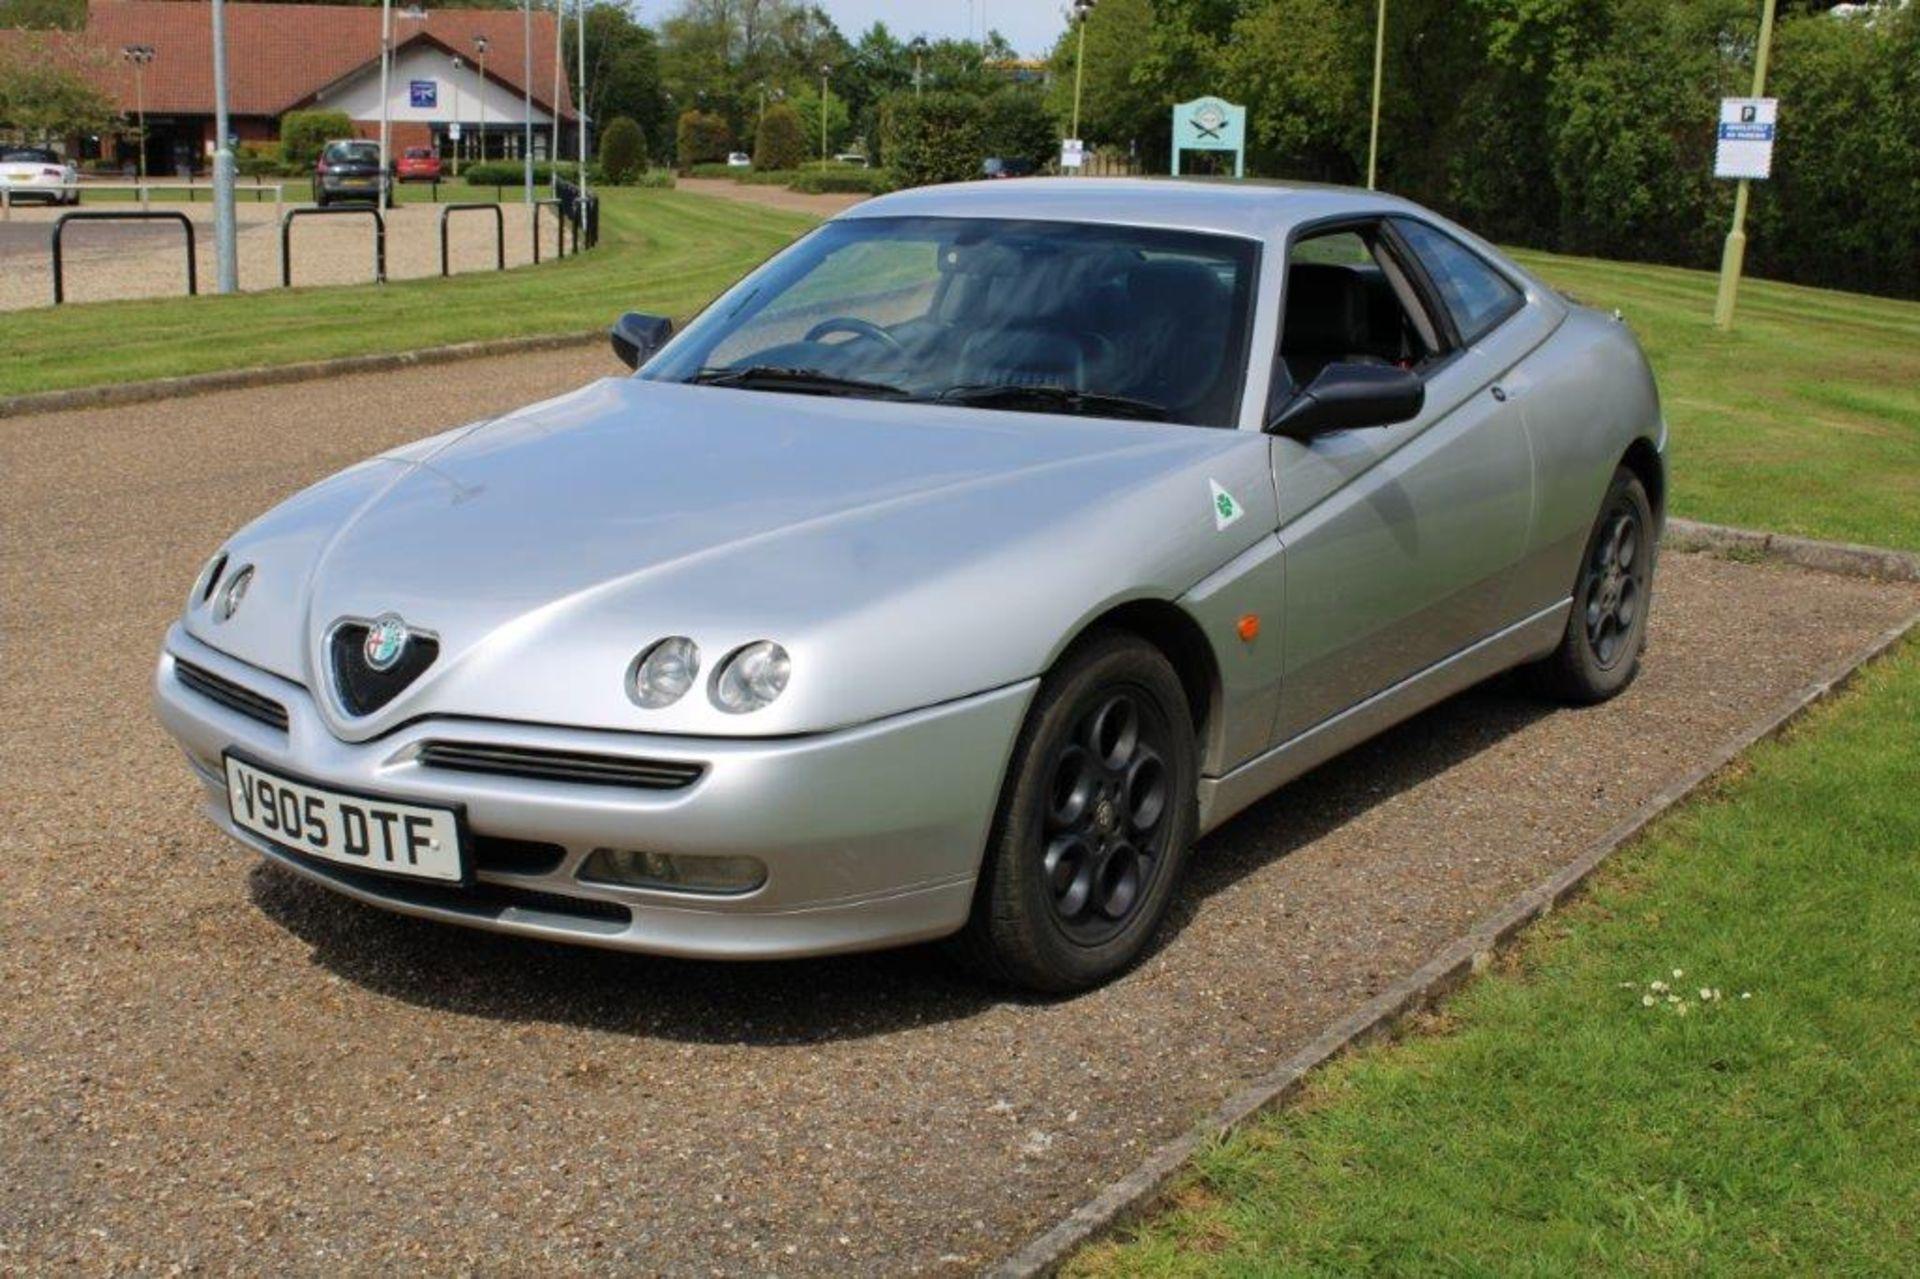 1999 Alfa Romeo GTV Lusso T-Spark 16v - Image 9 of 18